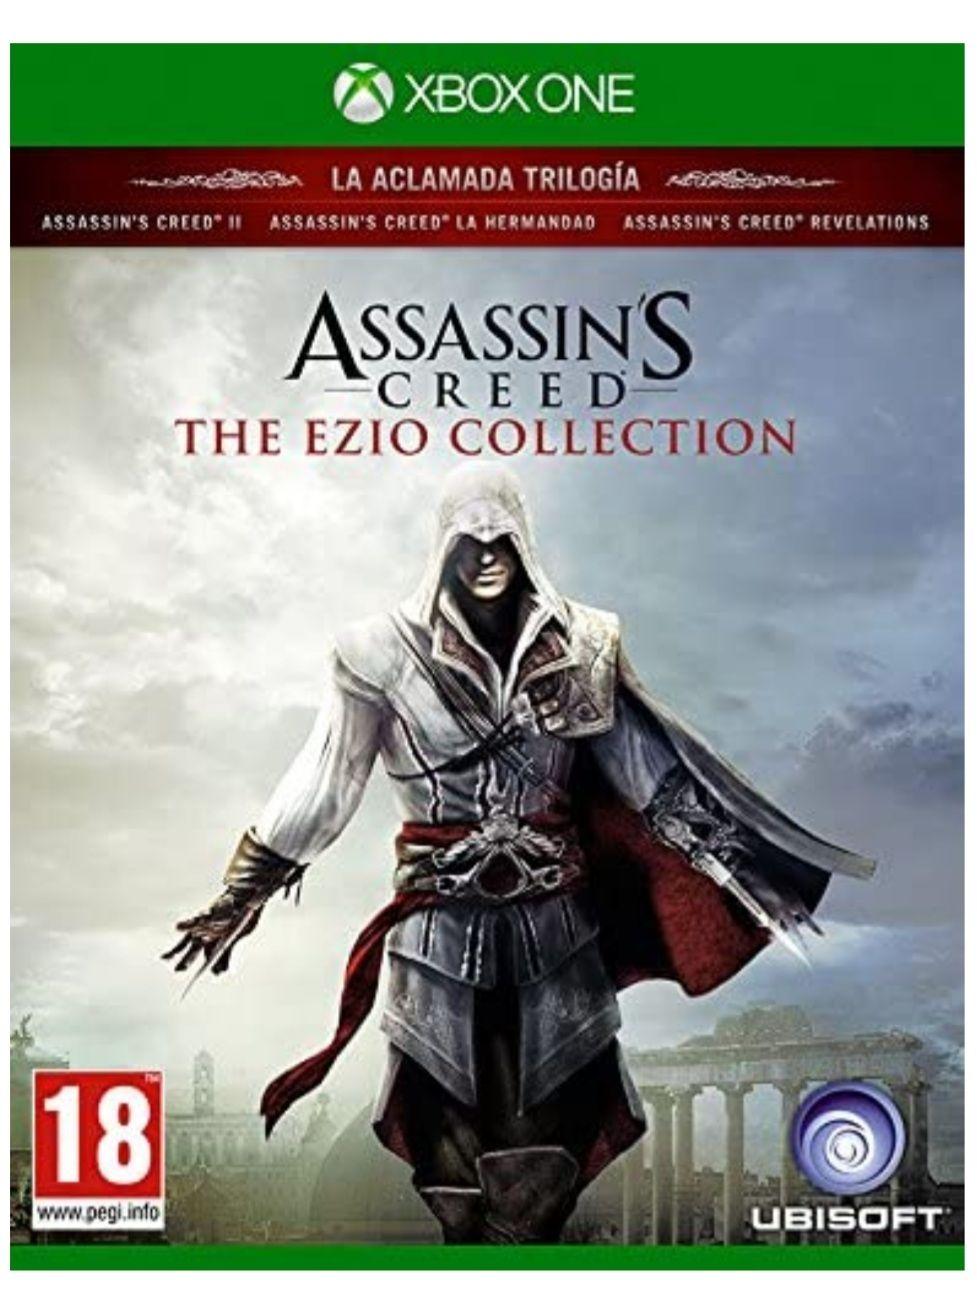 Assassin's Creed The Ezio Collection - Xbox One (Mediamarkt y Amazon)